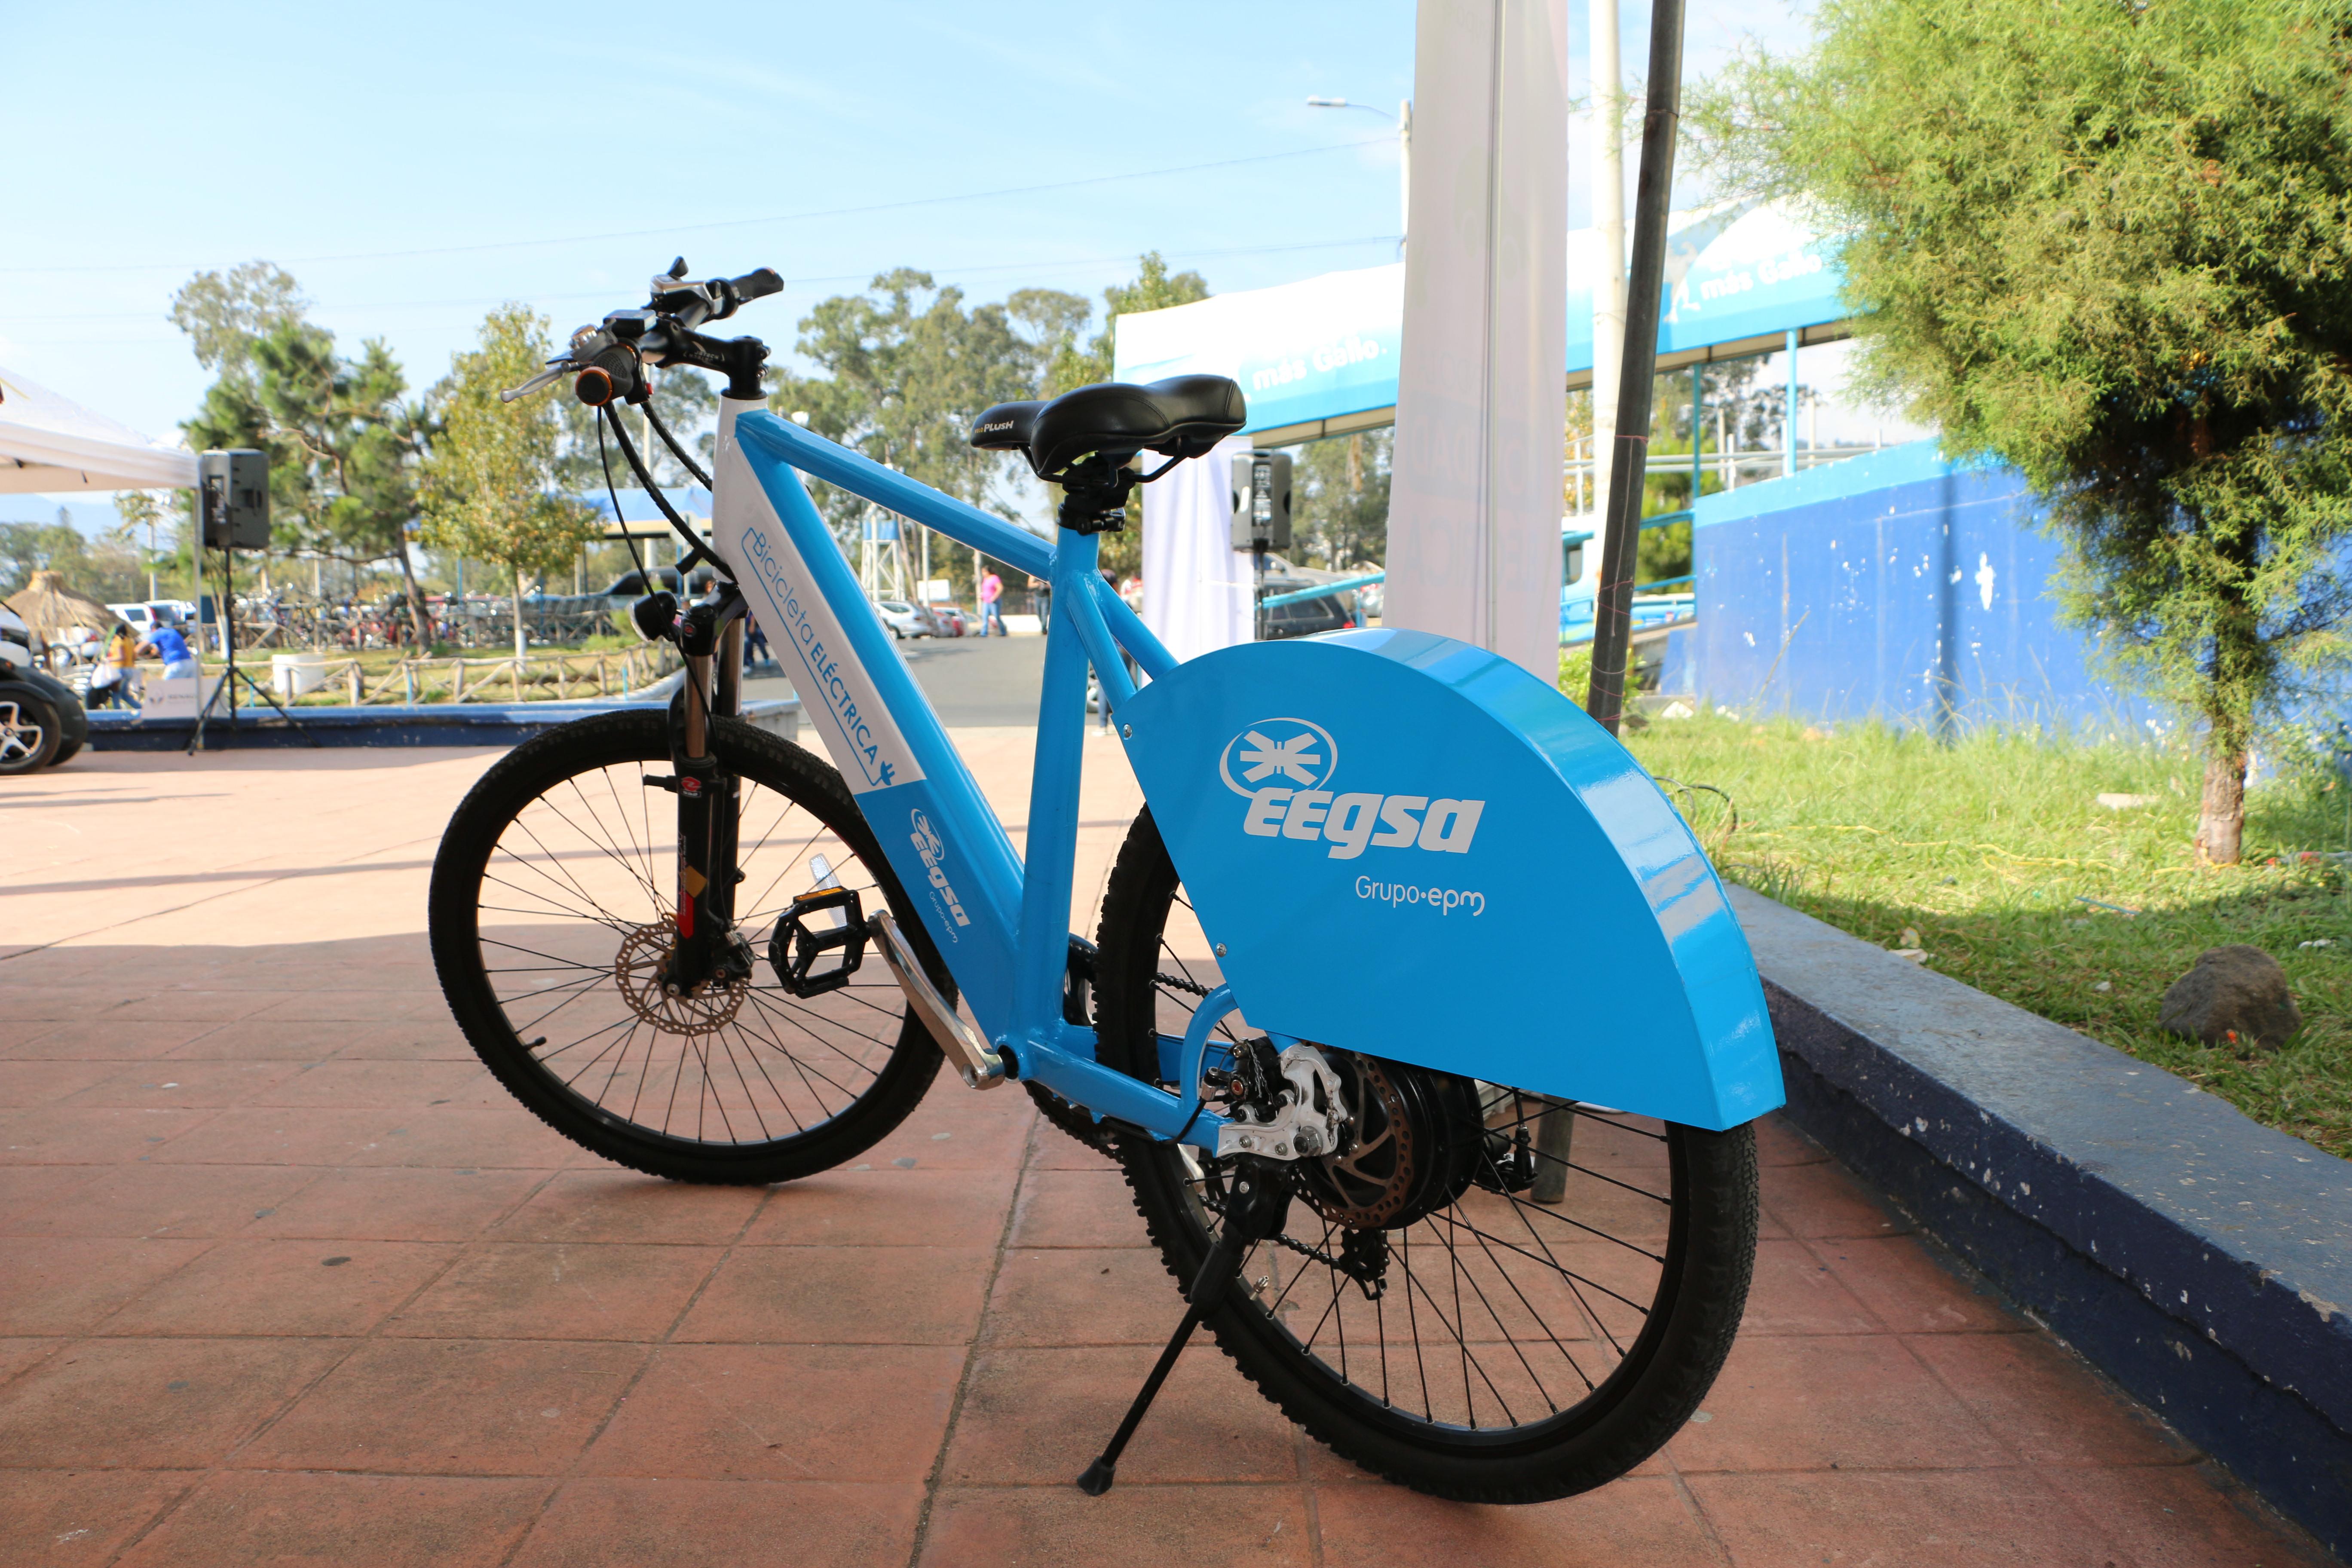 https://eegsa.com/wp-content/uploads/2019/06/Bicicleta-eléctrica.jpg